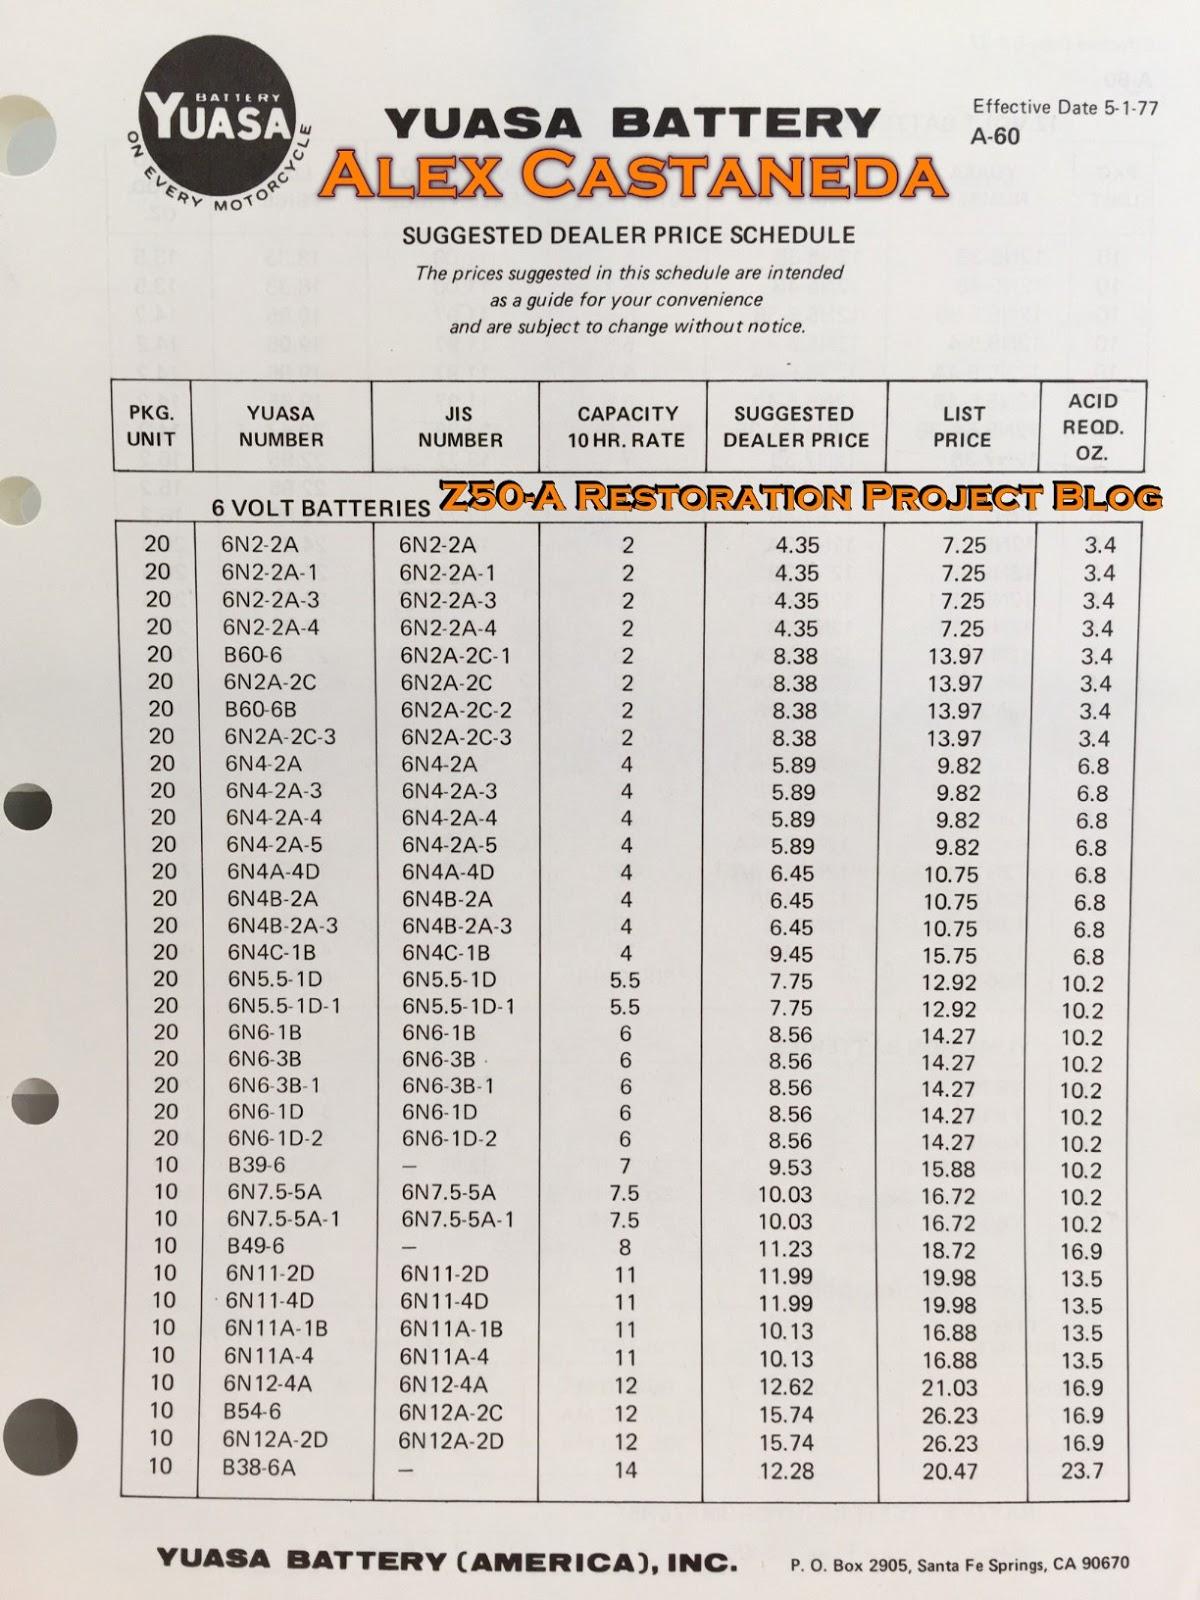 Wiring Diagram On Honda Dax Minimoto Mini Moto Yuasa Battery Chart Motorcycles Z50 Trail Monkey Rh Z50a Restoration Project Blogspot Com